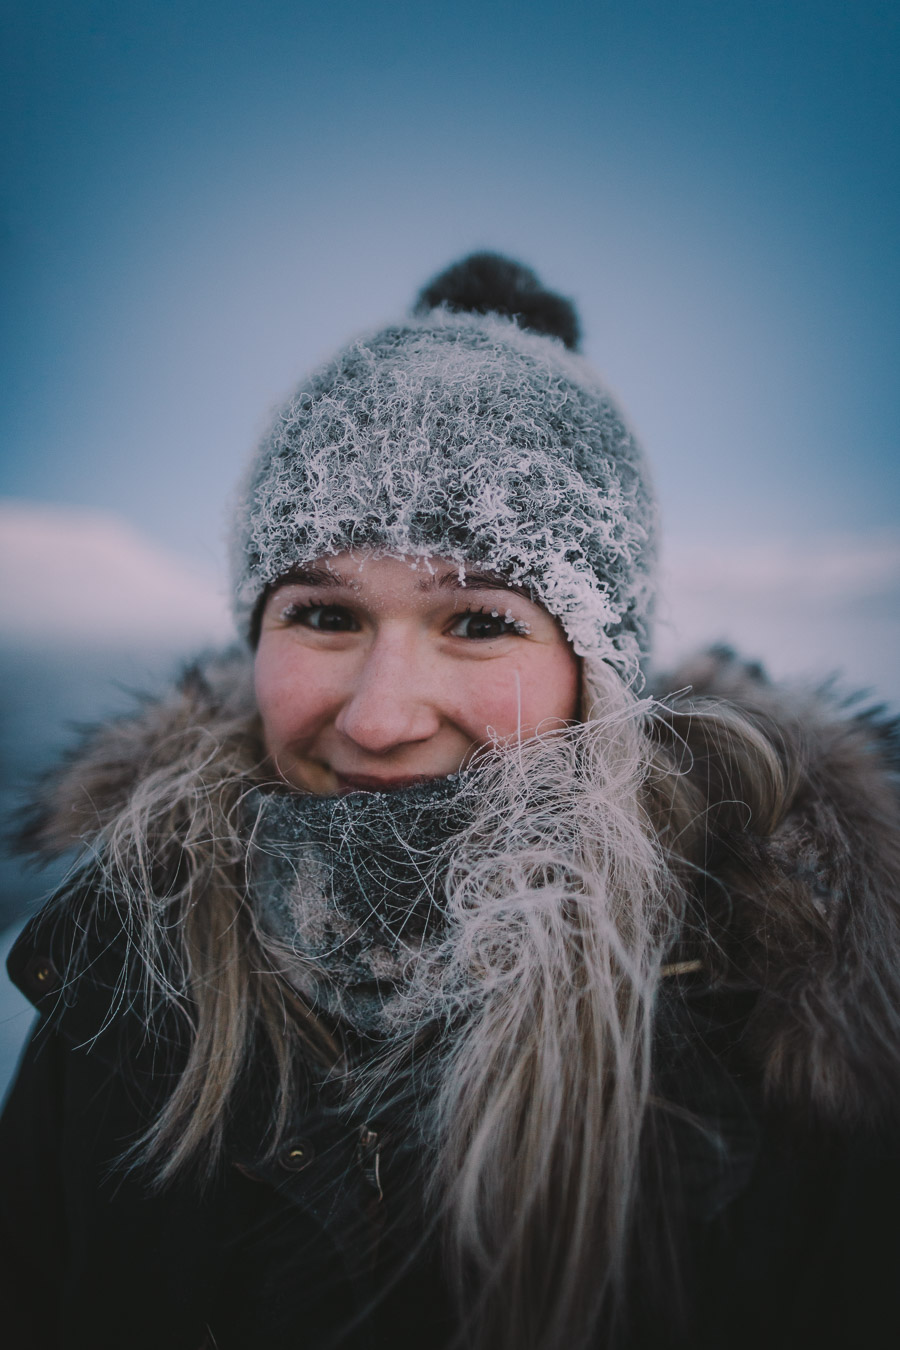 Frozen girl's hair